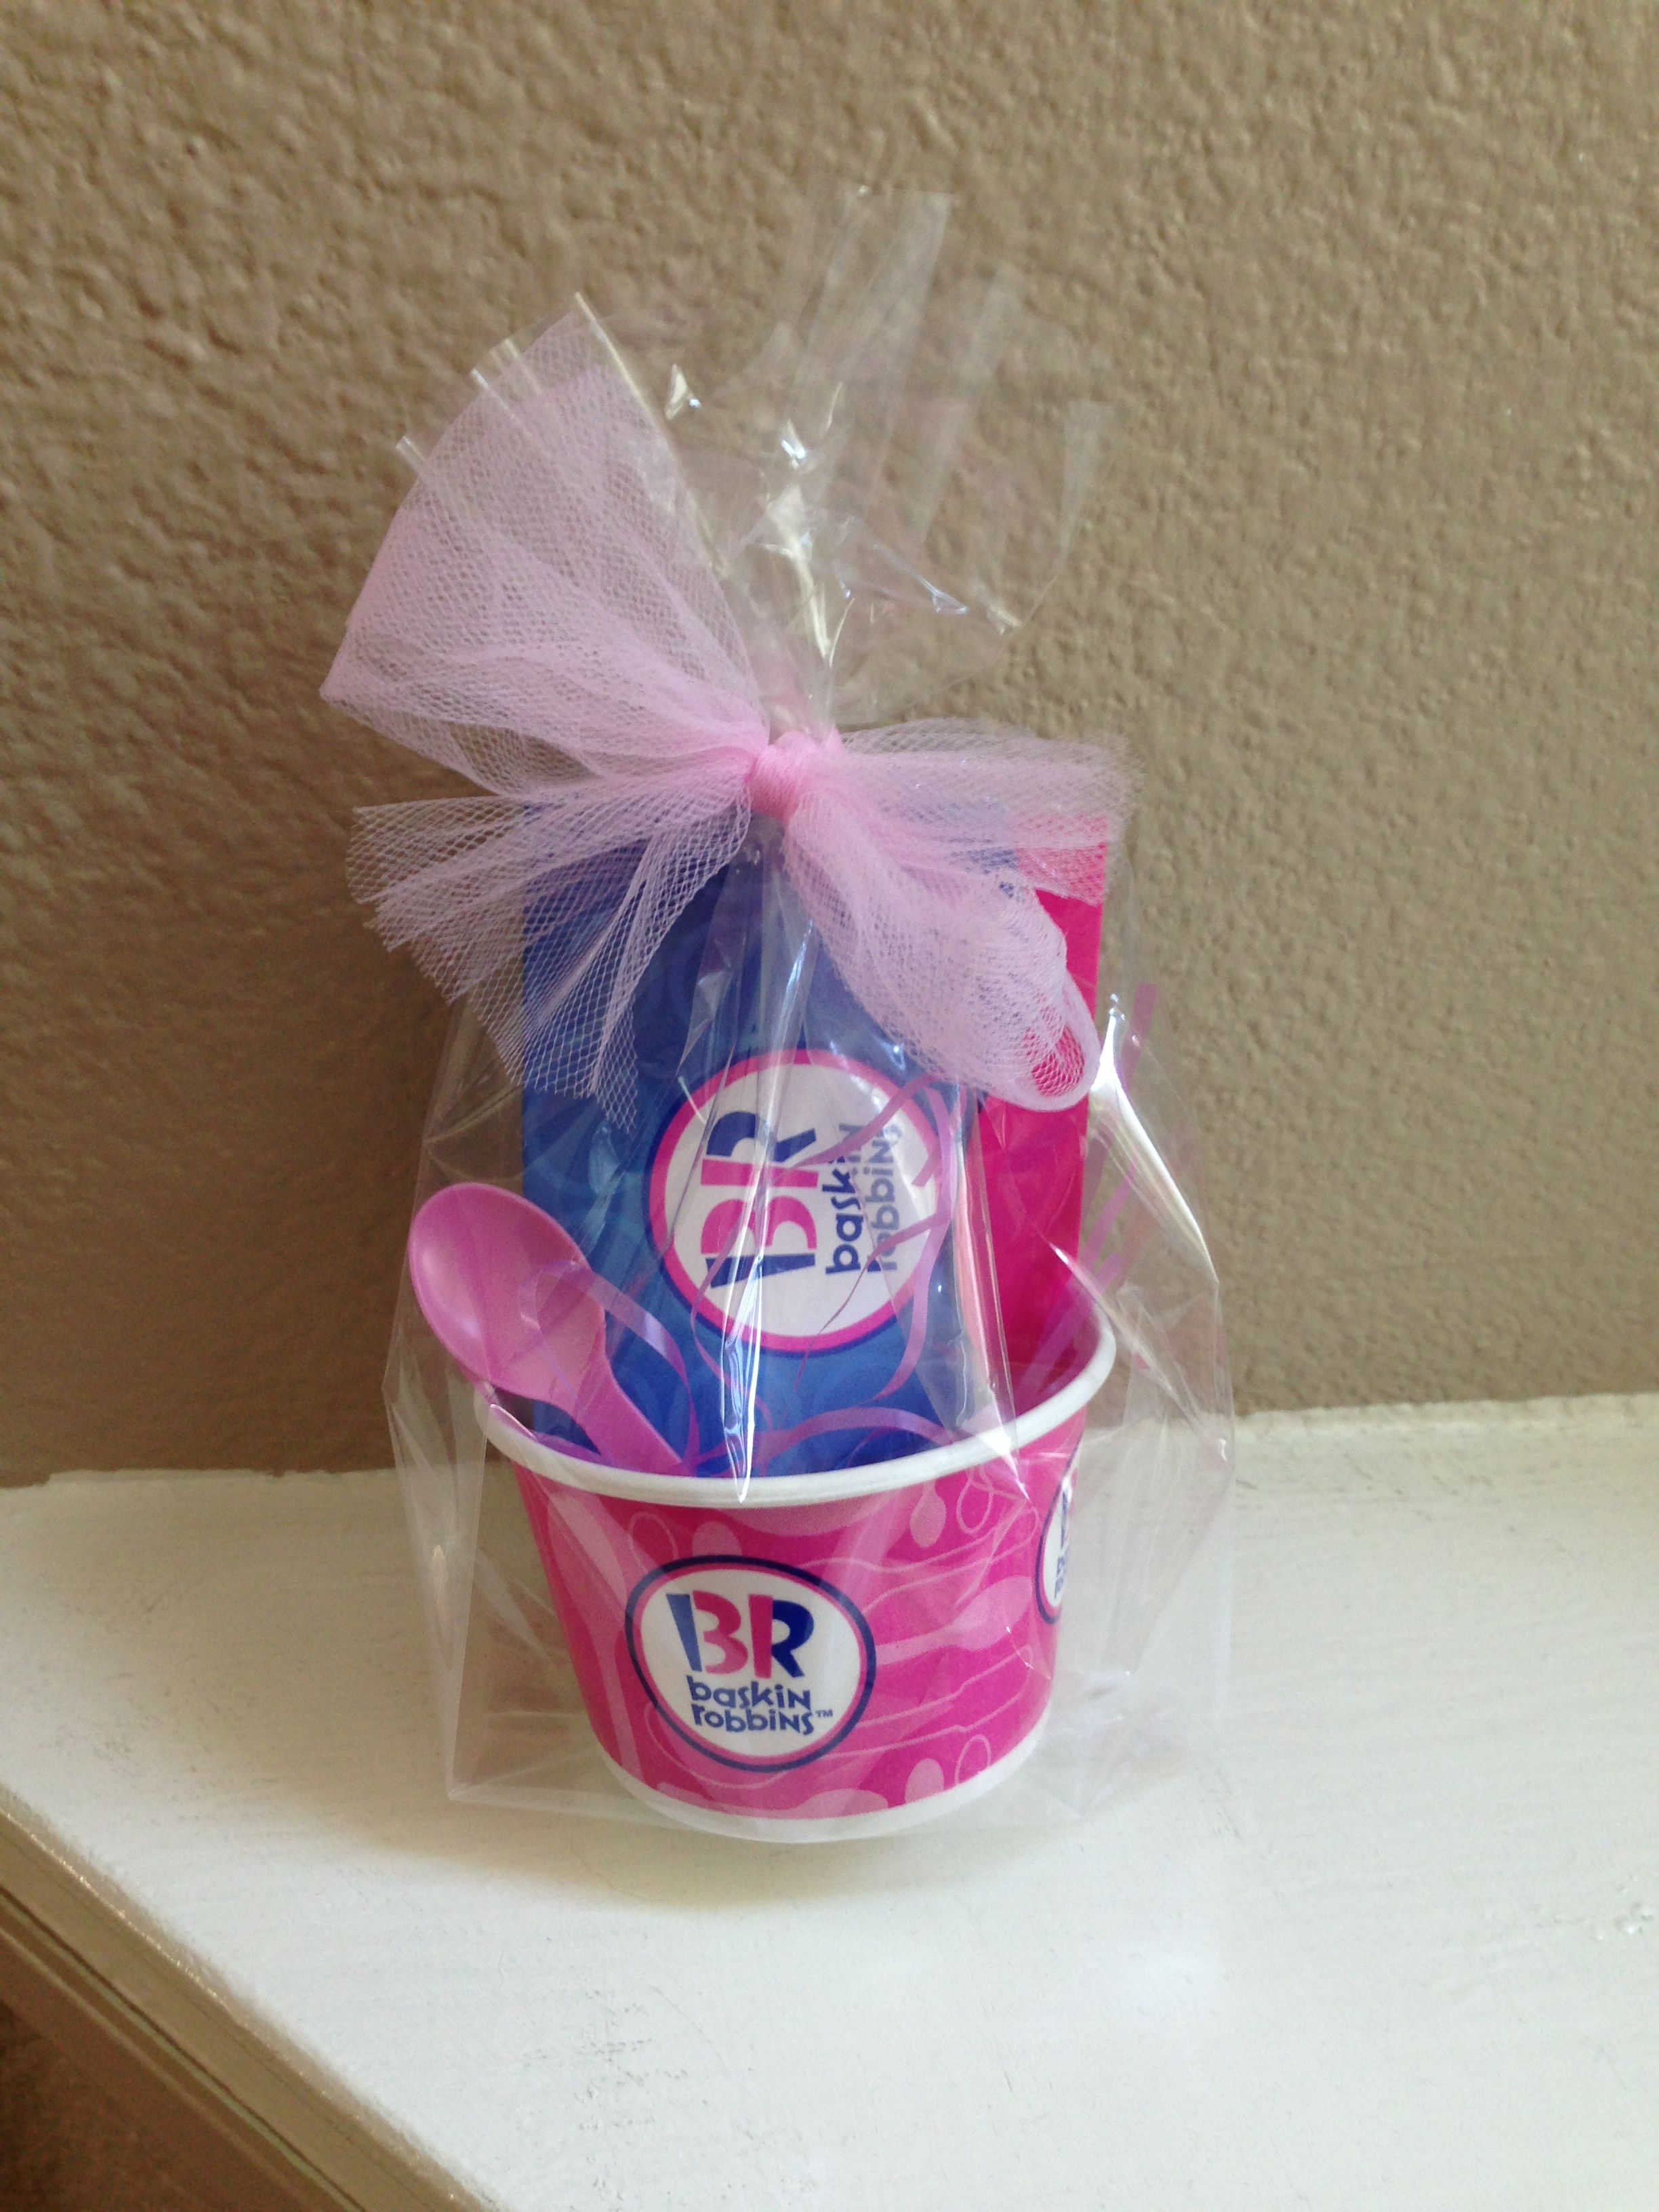 Baskin robbins gift card party favor getting crafty